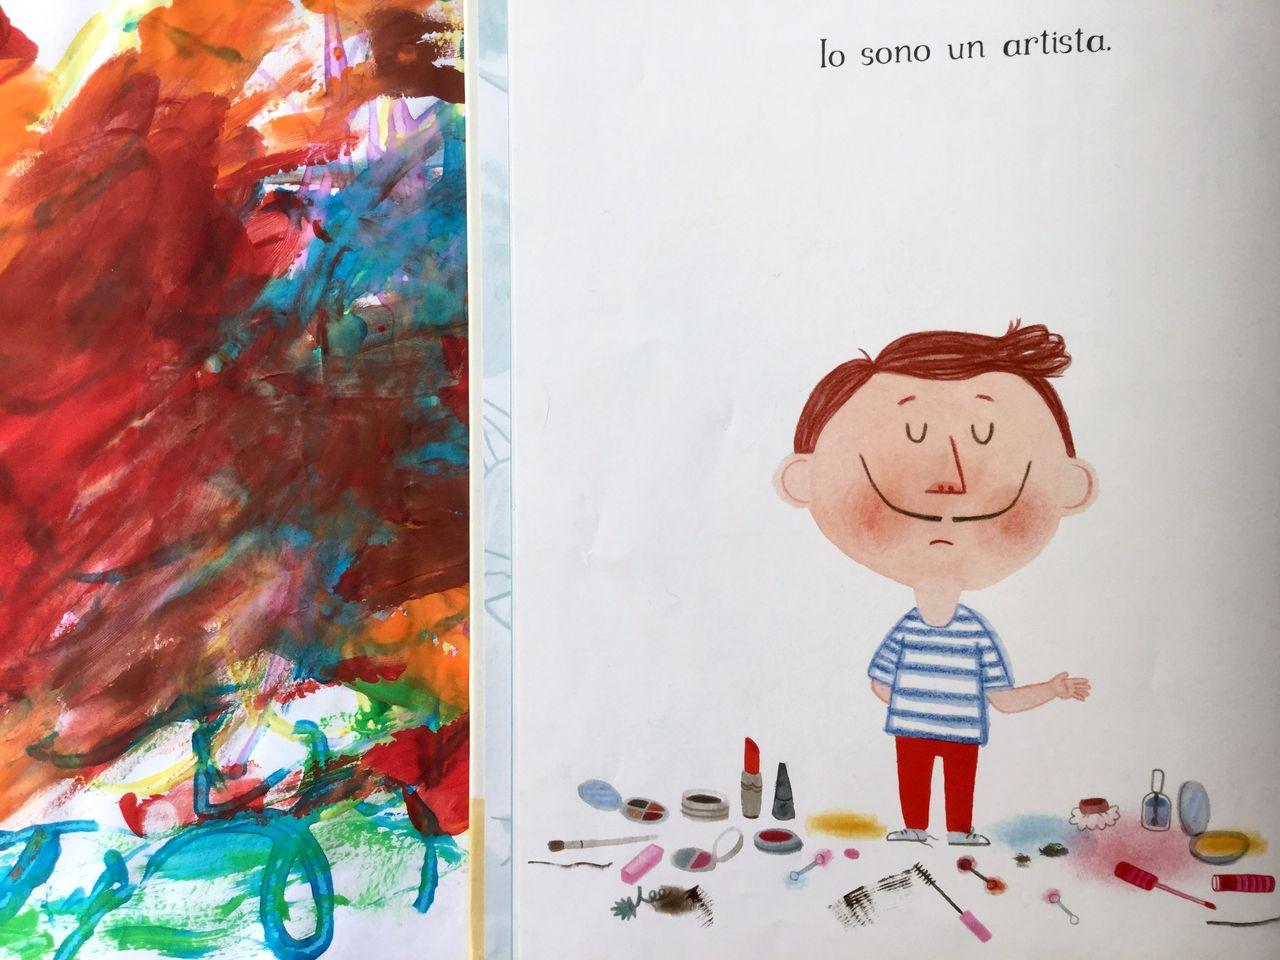 Marta Altés, Io sono un artista, Emme